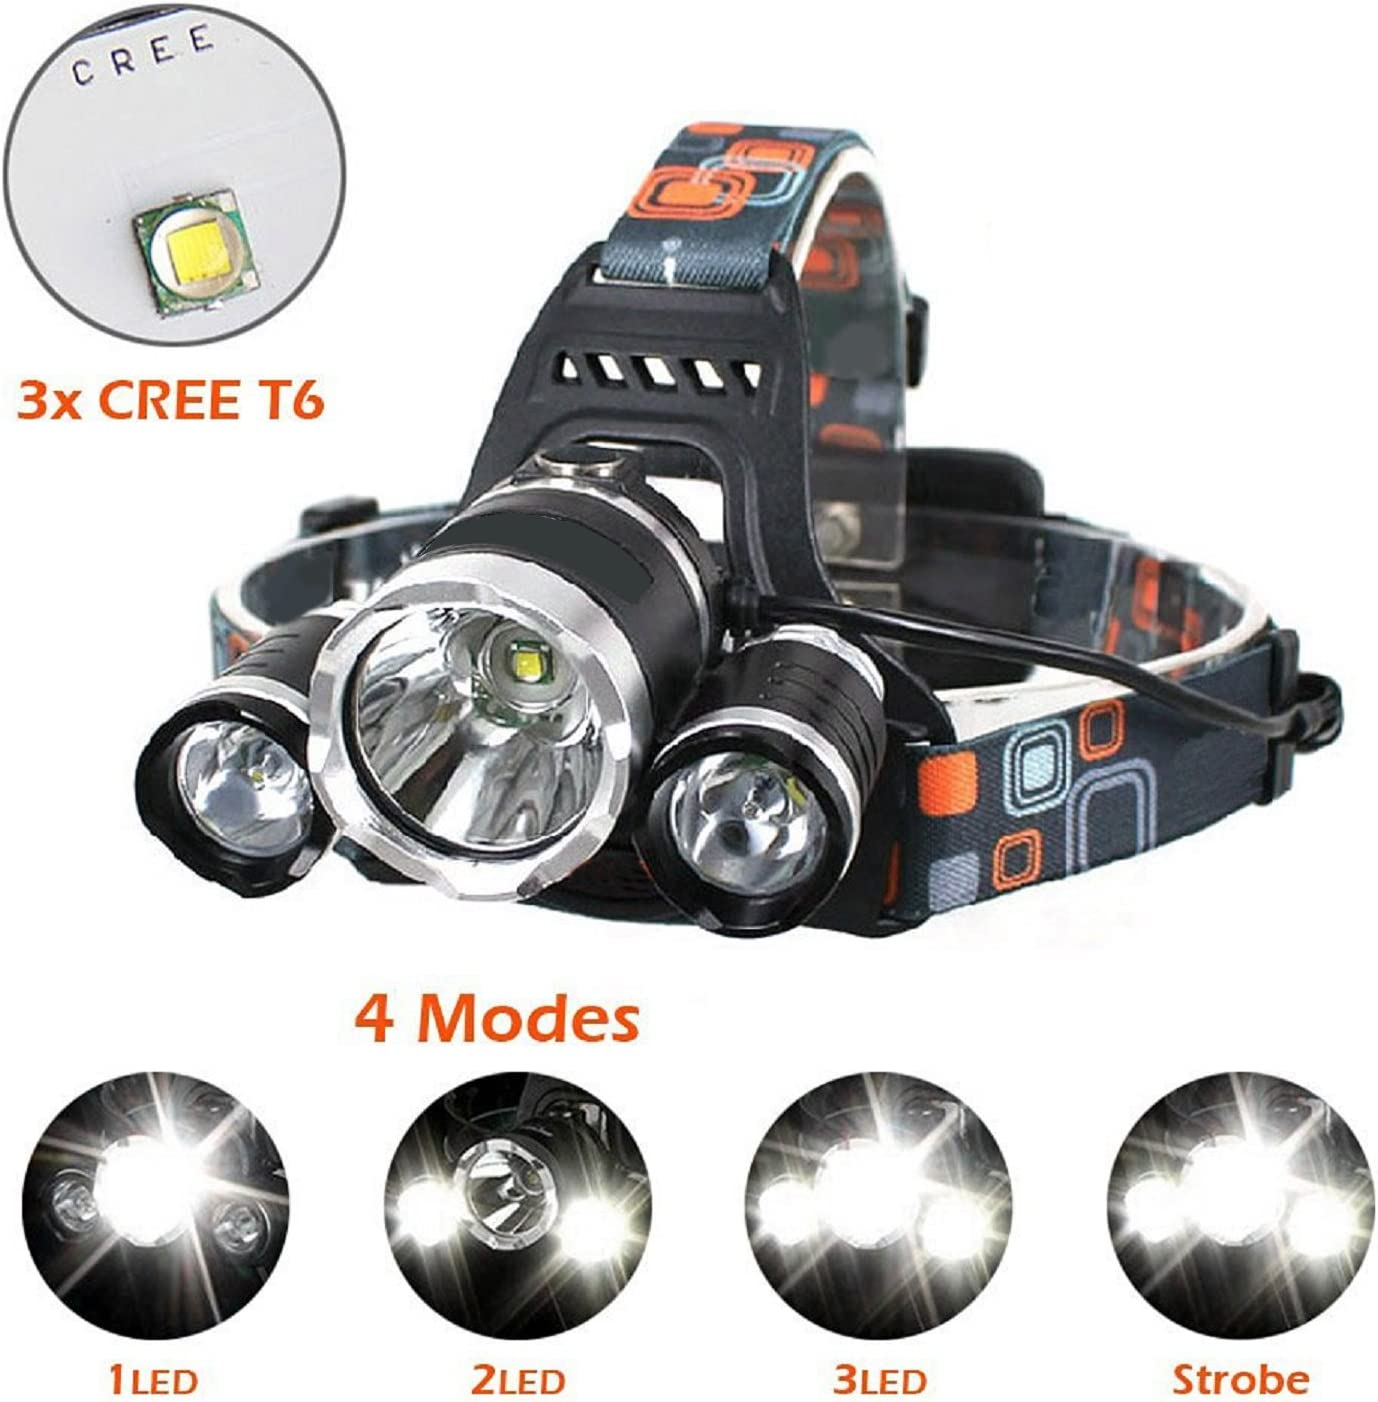 Vanitek LED Headlamp Headlight Flashlight of 5000 Lumens with Rechargeable Batte